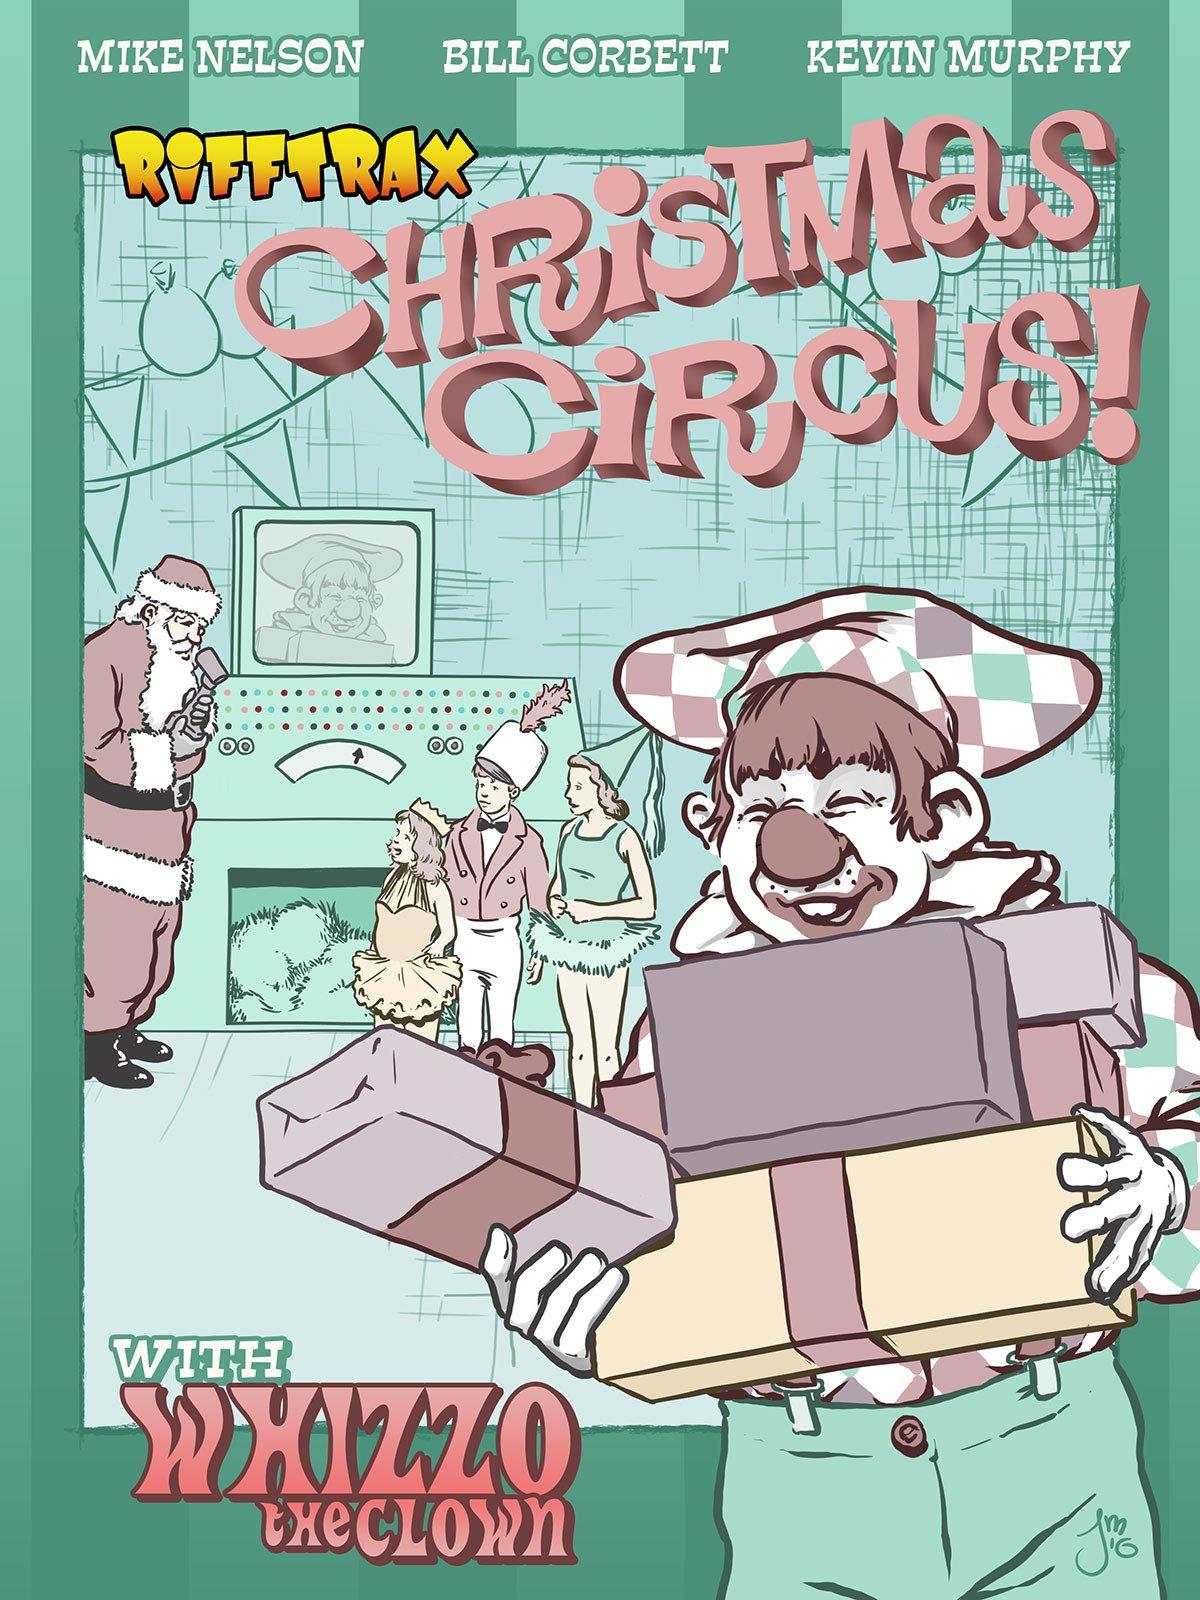 RiffTrax Christmas Circus with Whizzo the Clown